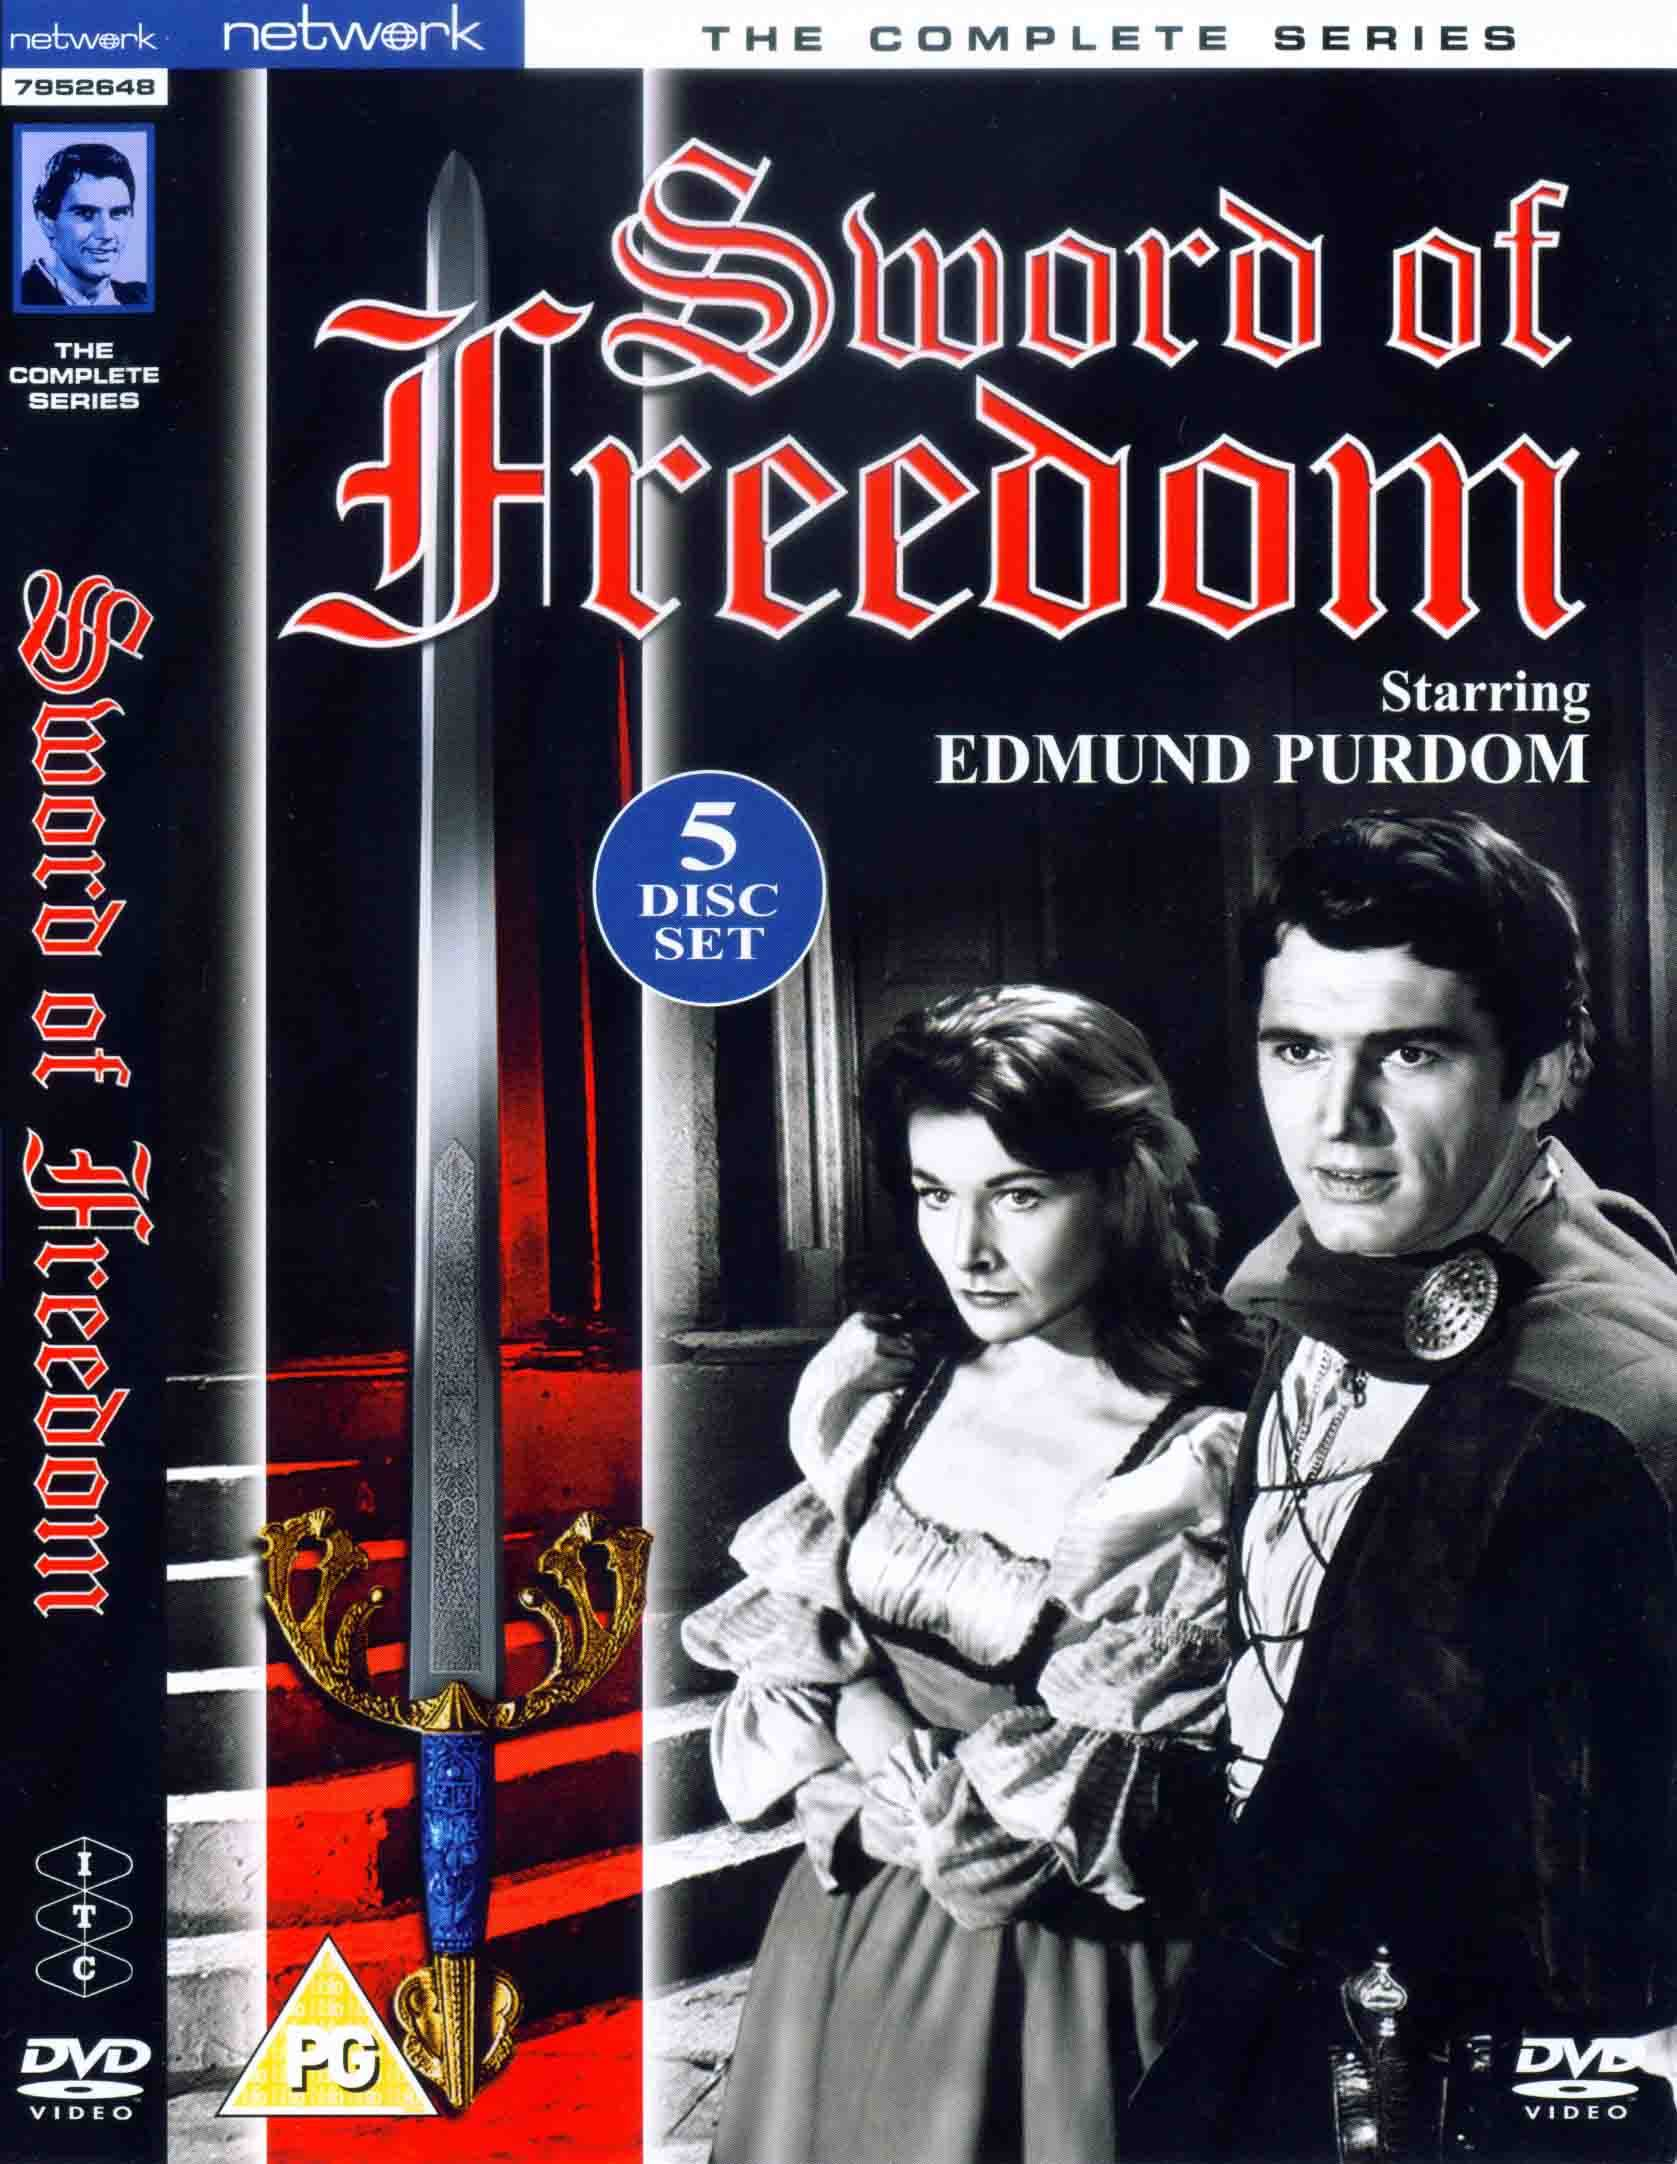 Sword of Freedom - Complete Series DVD Set (UK reg. 2 release)